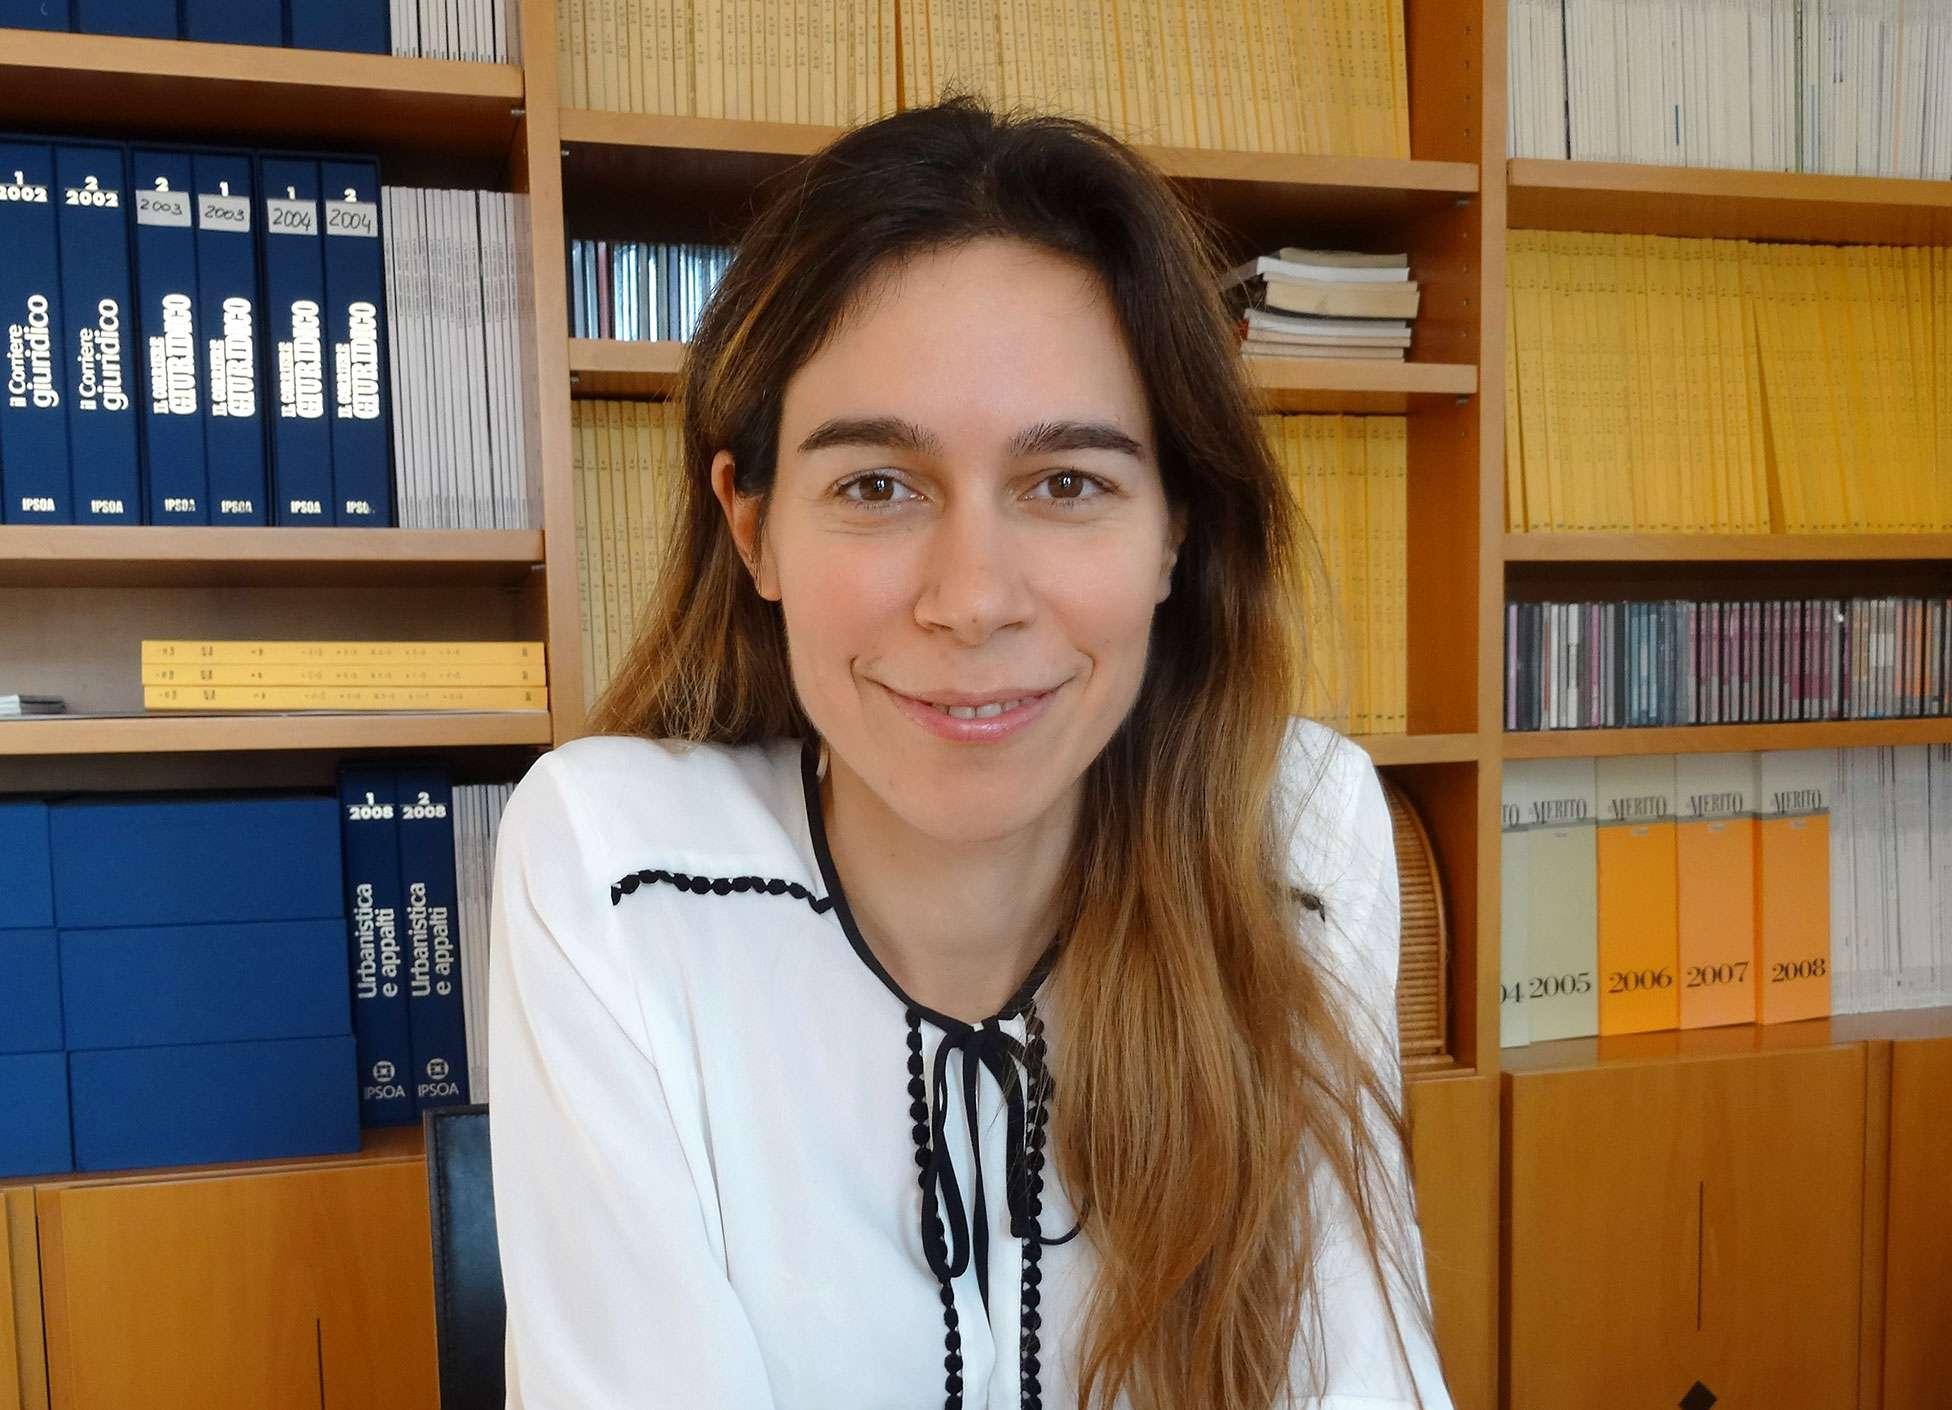 Avvocato Serena Patrisso